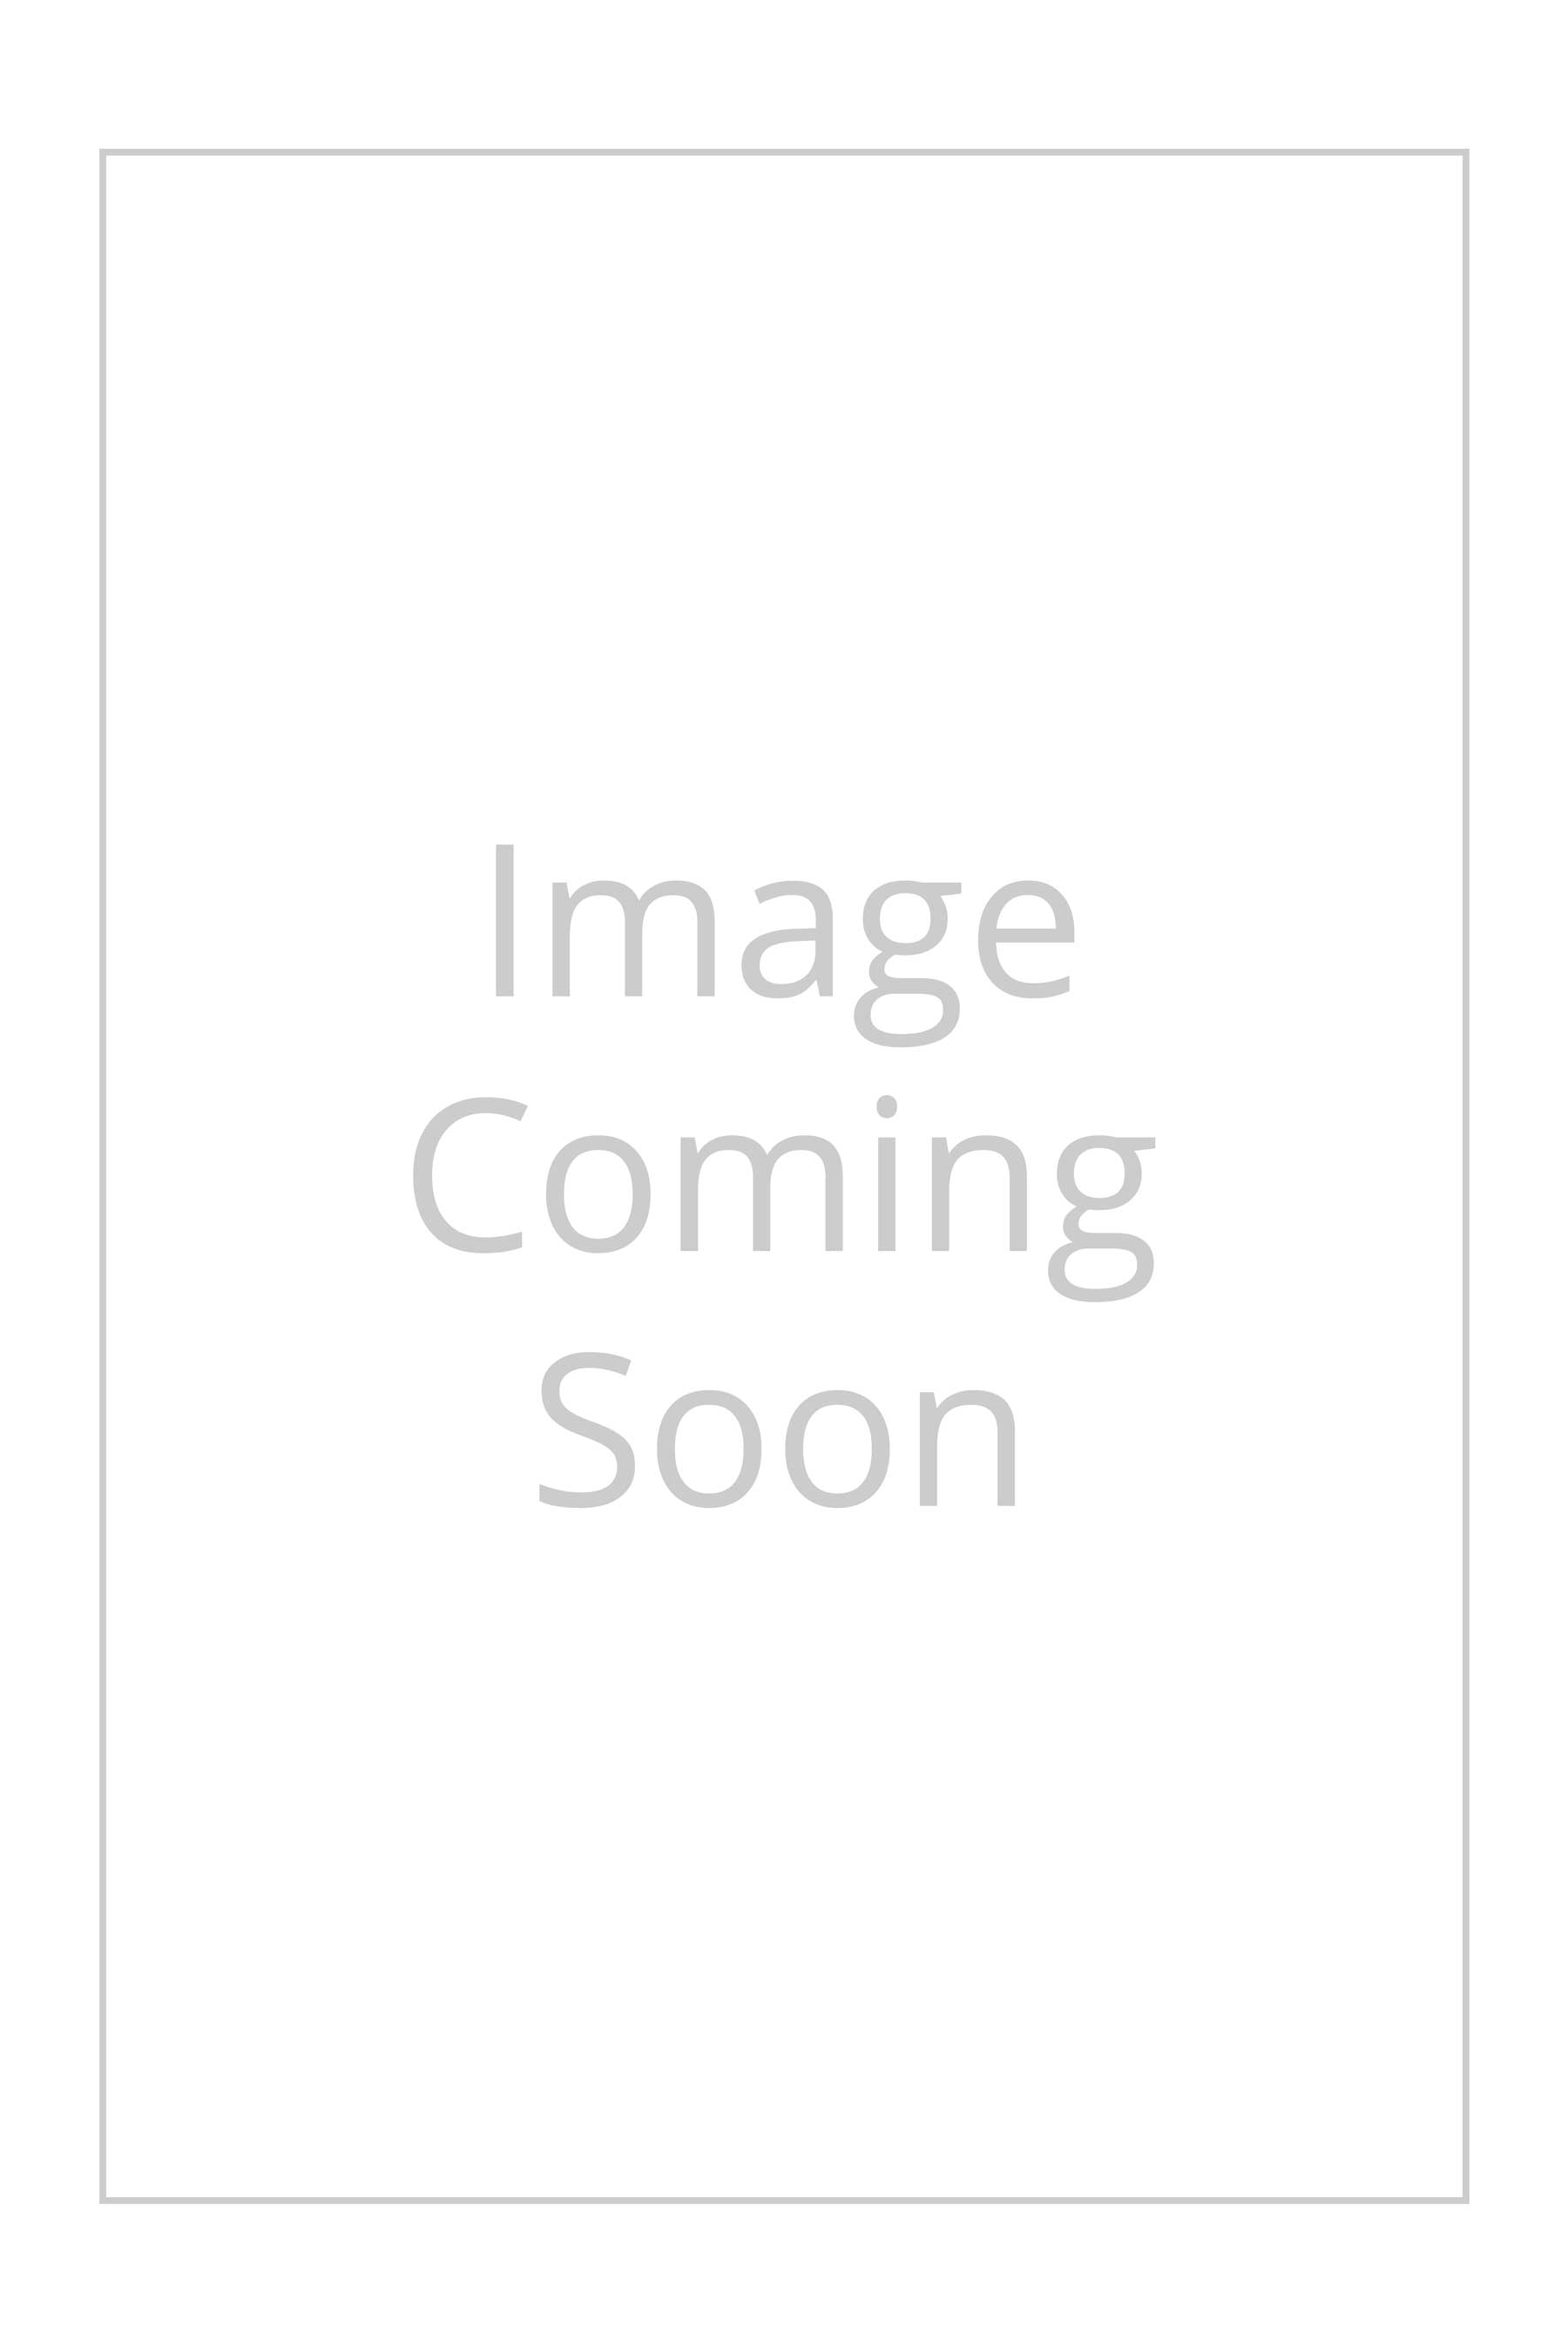 St. John Knits Black Milano Knit Wool Jacket w/ Leather Sleeves